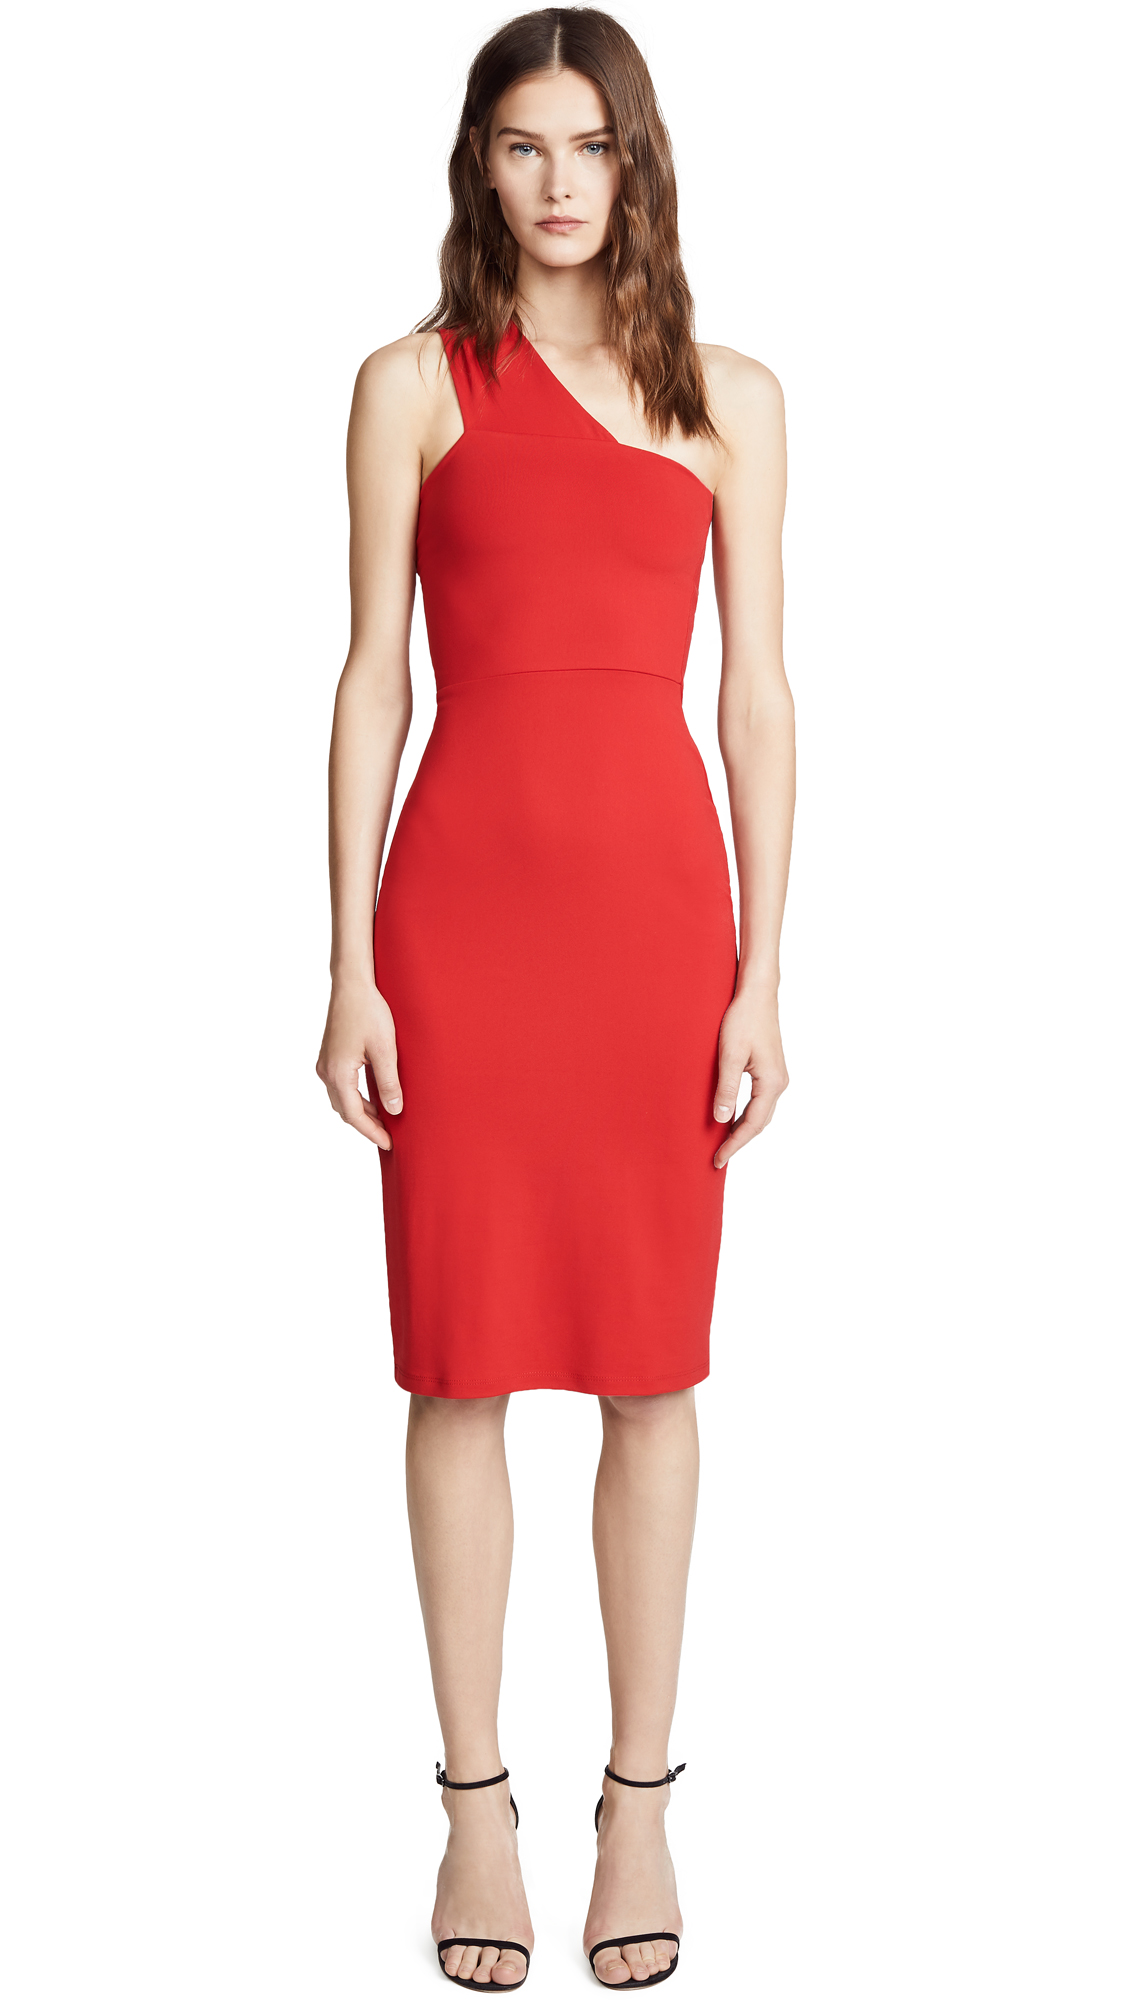 Susana Monaco Tina One Shoulder Dress - Perfect Red